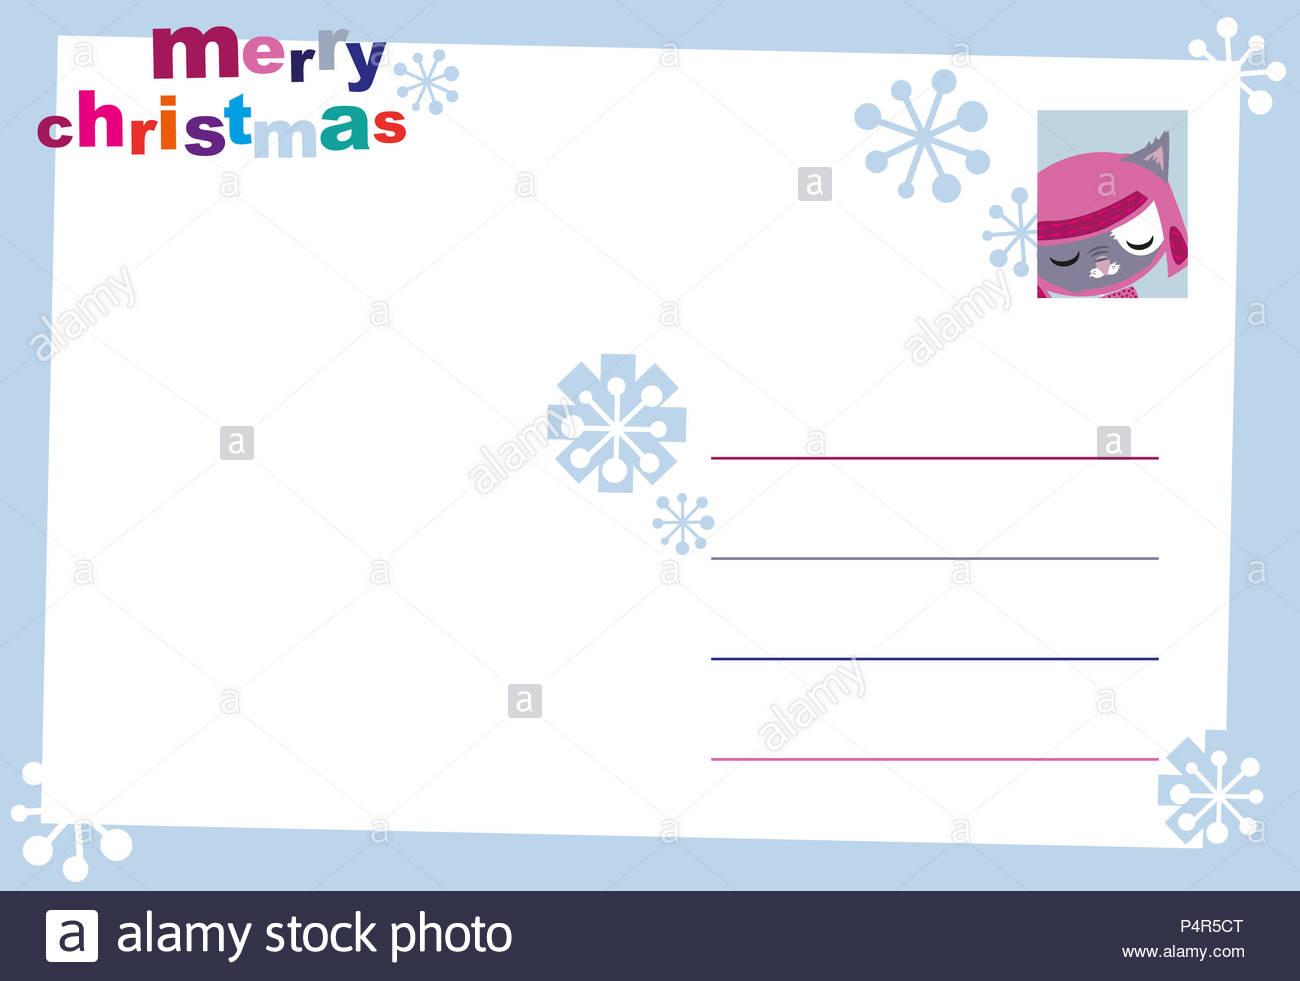 postcards r back christmas card cat 1 Stock Photo: 209492216 - Alamy